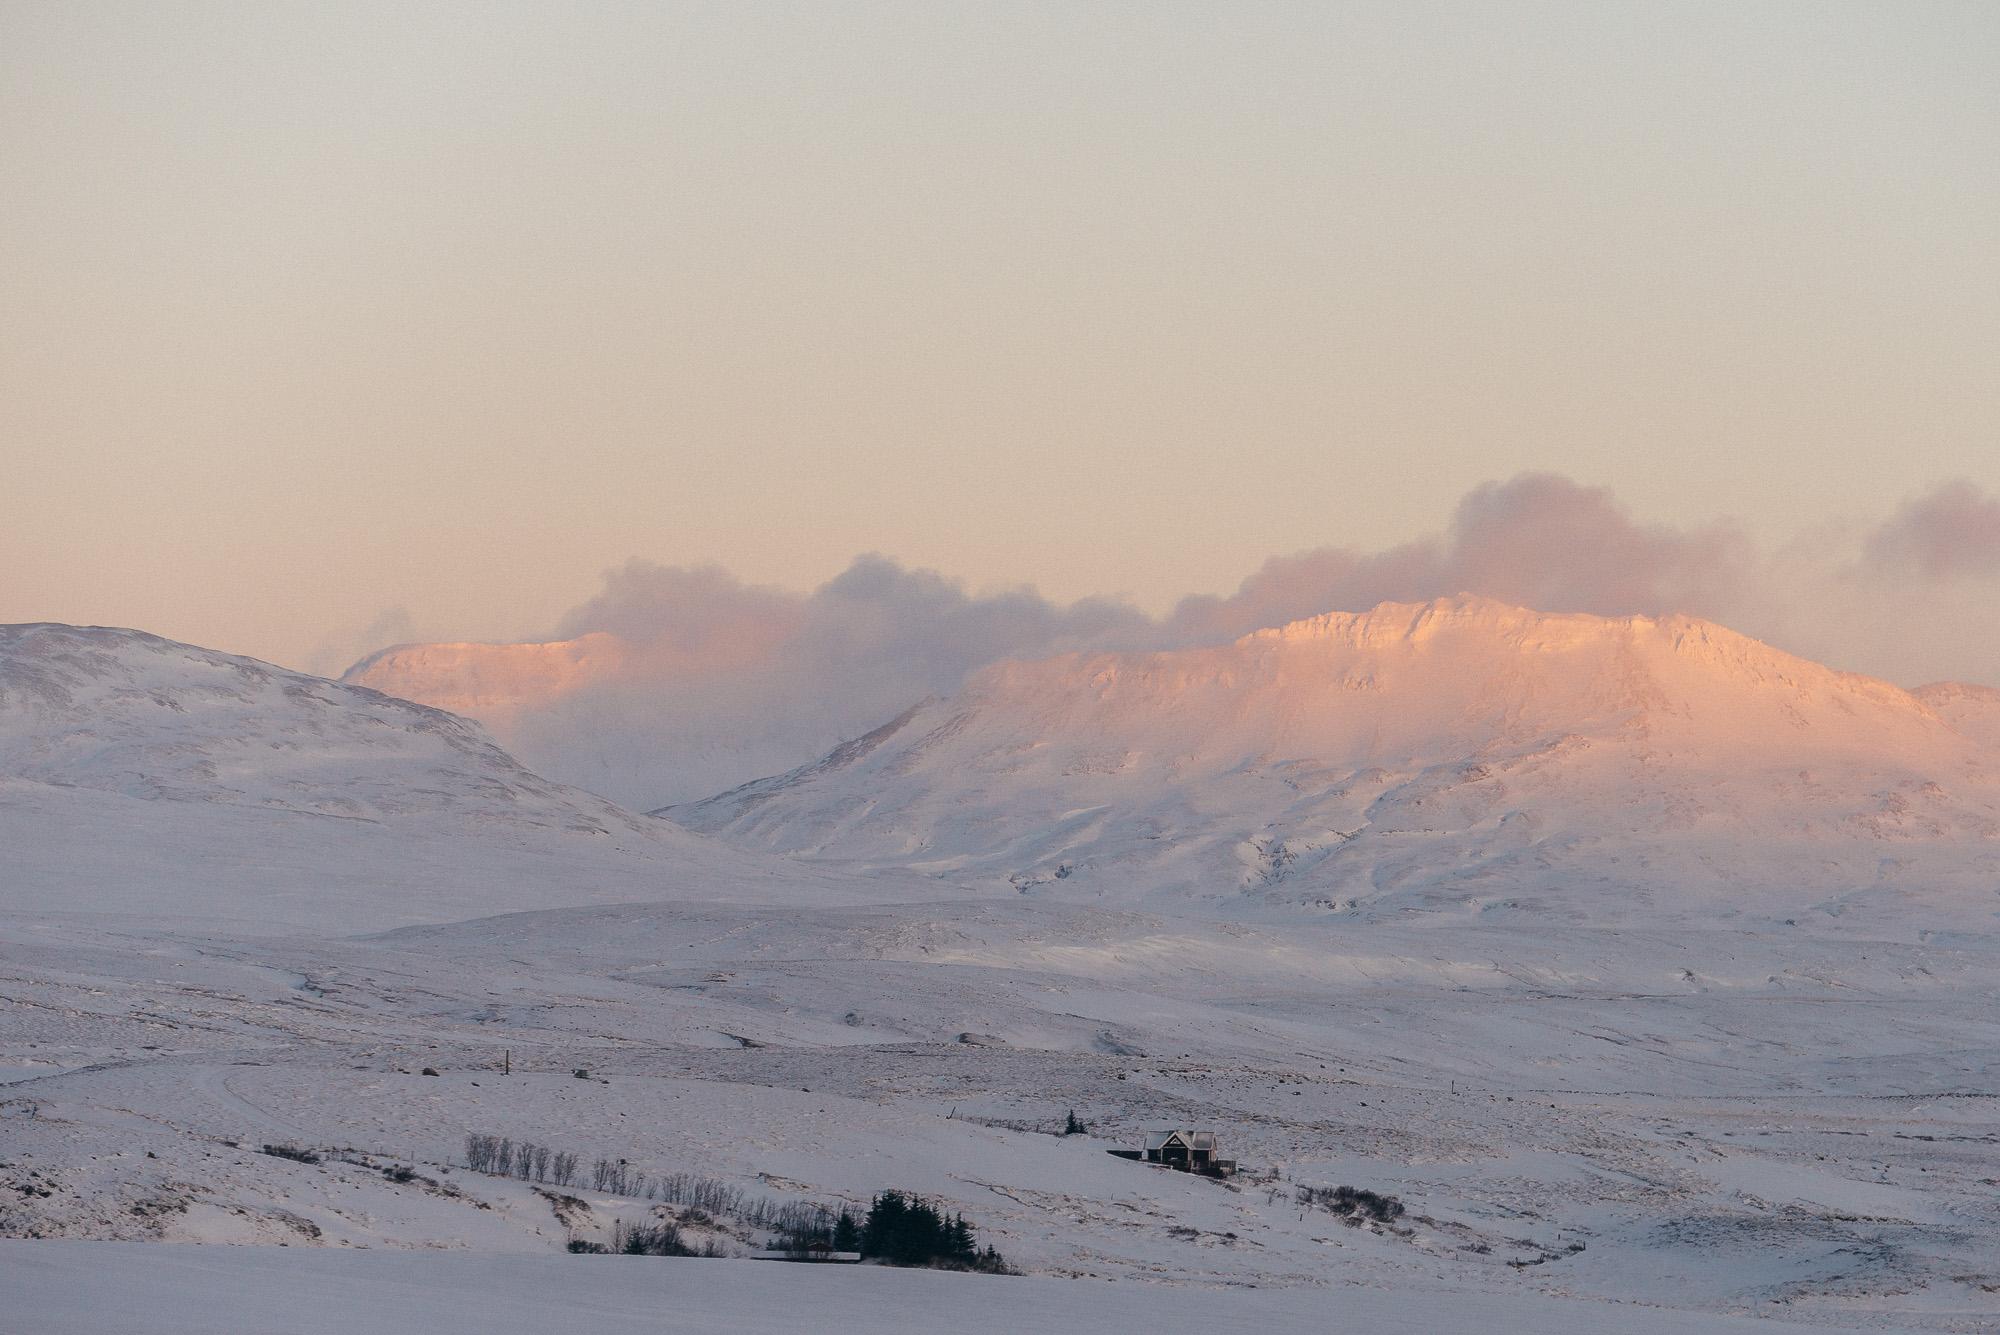 Winter - '17